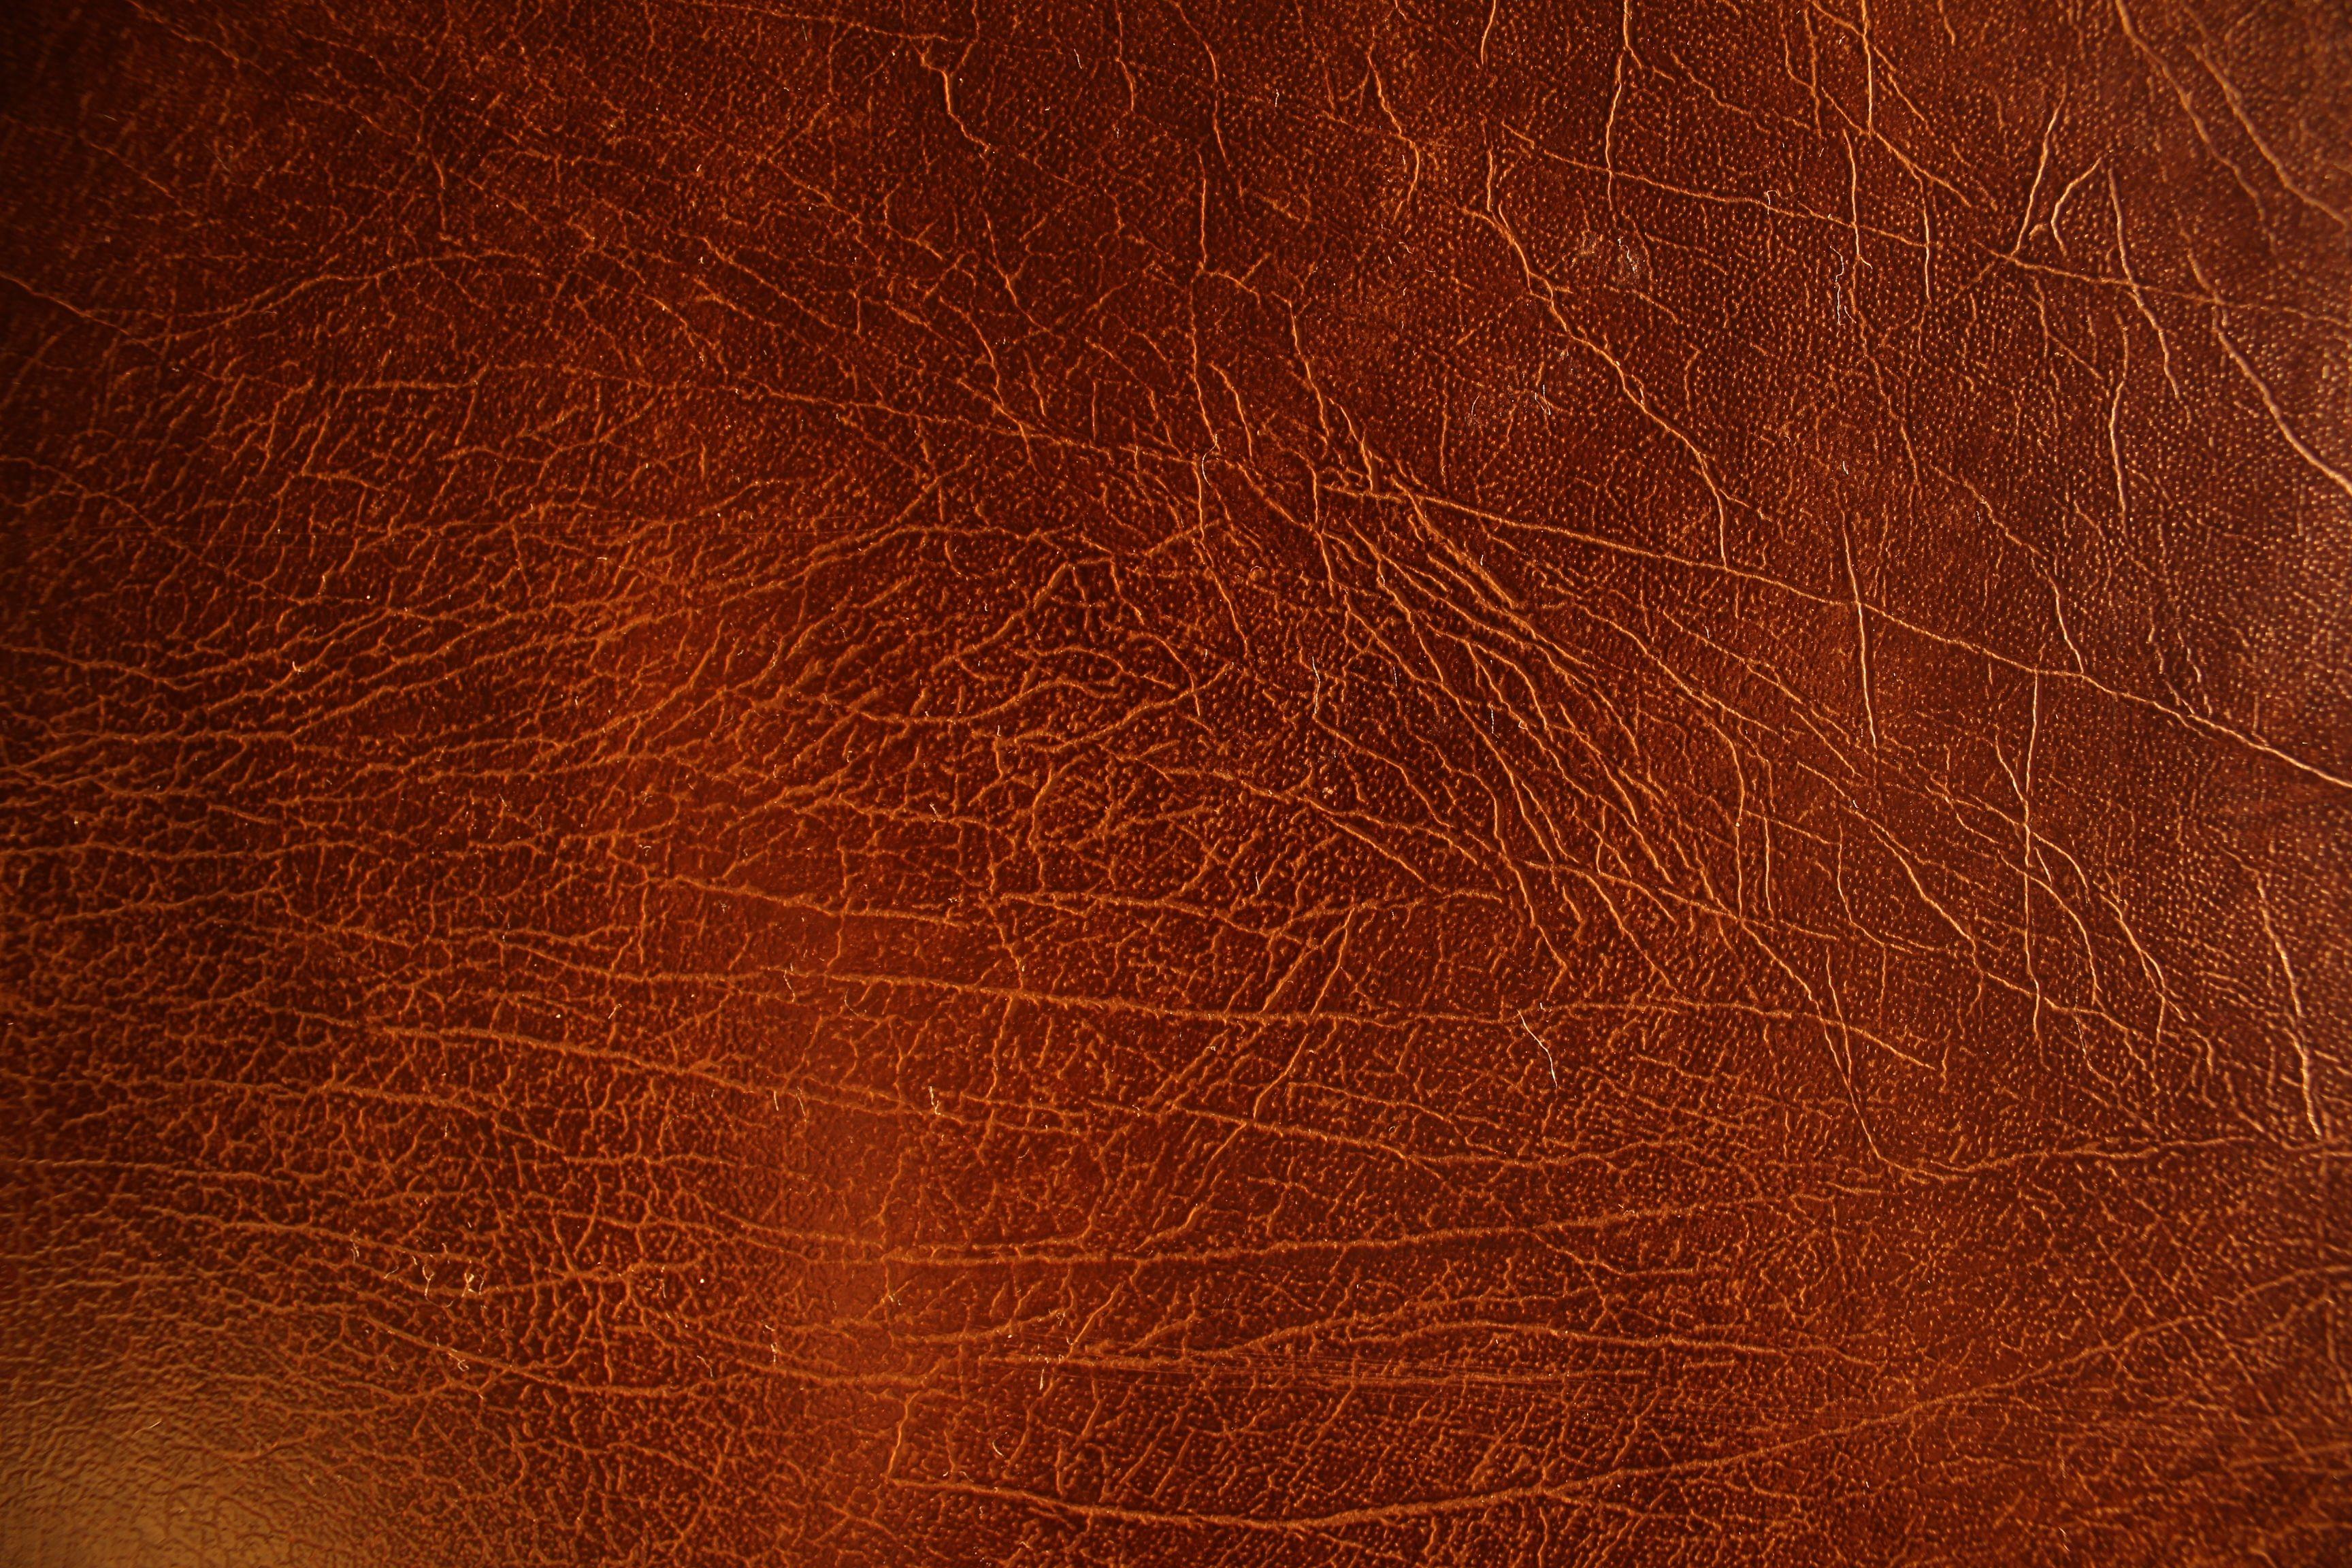 Leather Texture Desktop Wallpaper 49507 51181 Hd Wallpapers Jpg ...